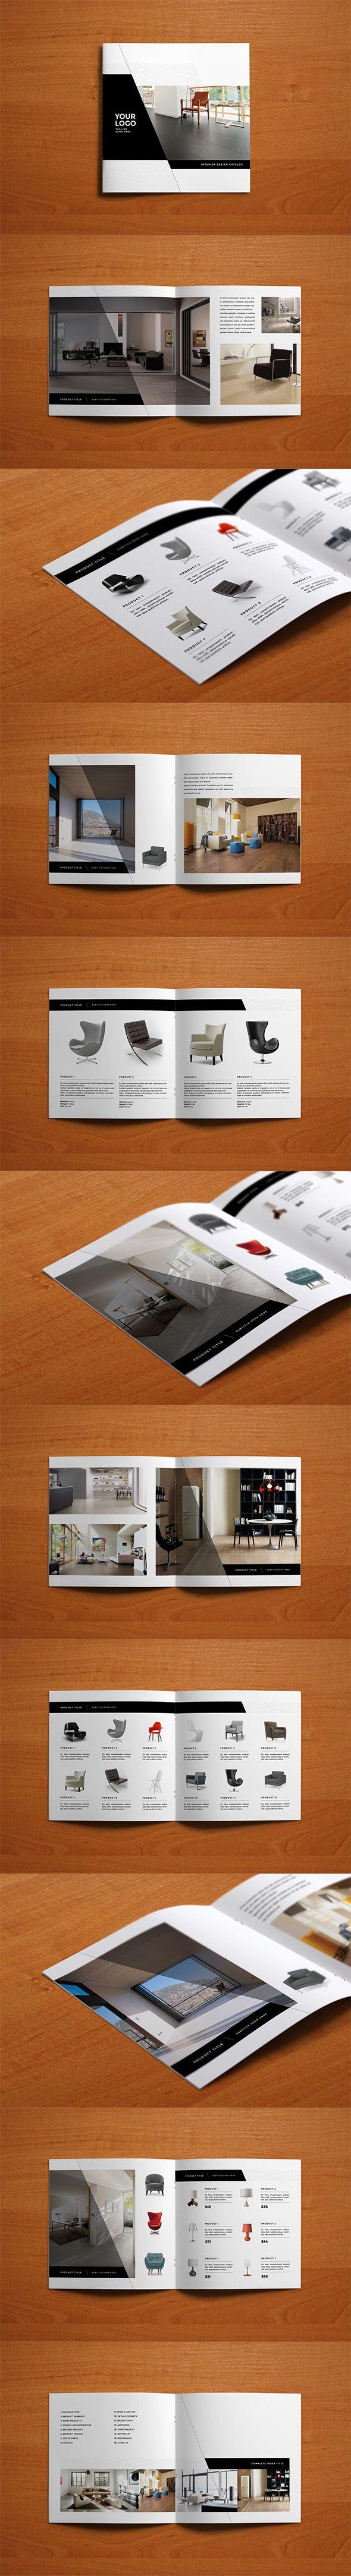 Minimal Interior Design Catalog on Behance